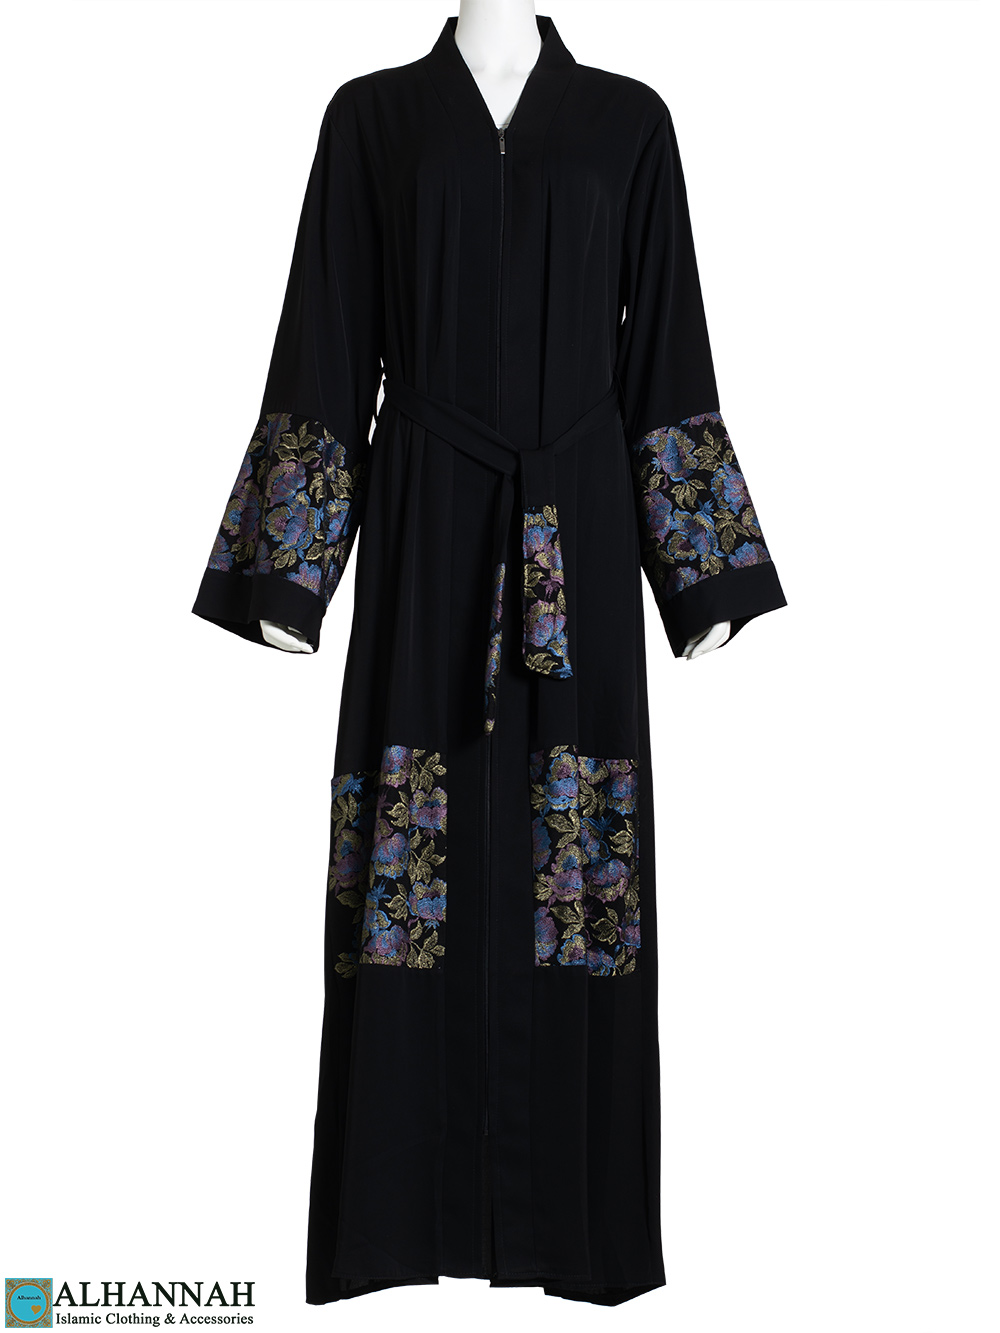 Laced Violet Floral Embroidered Black Abaya ab790